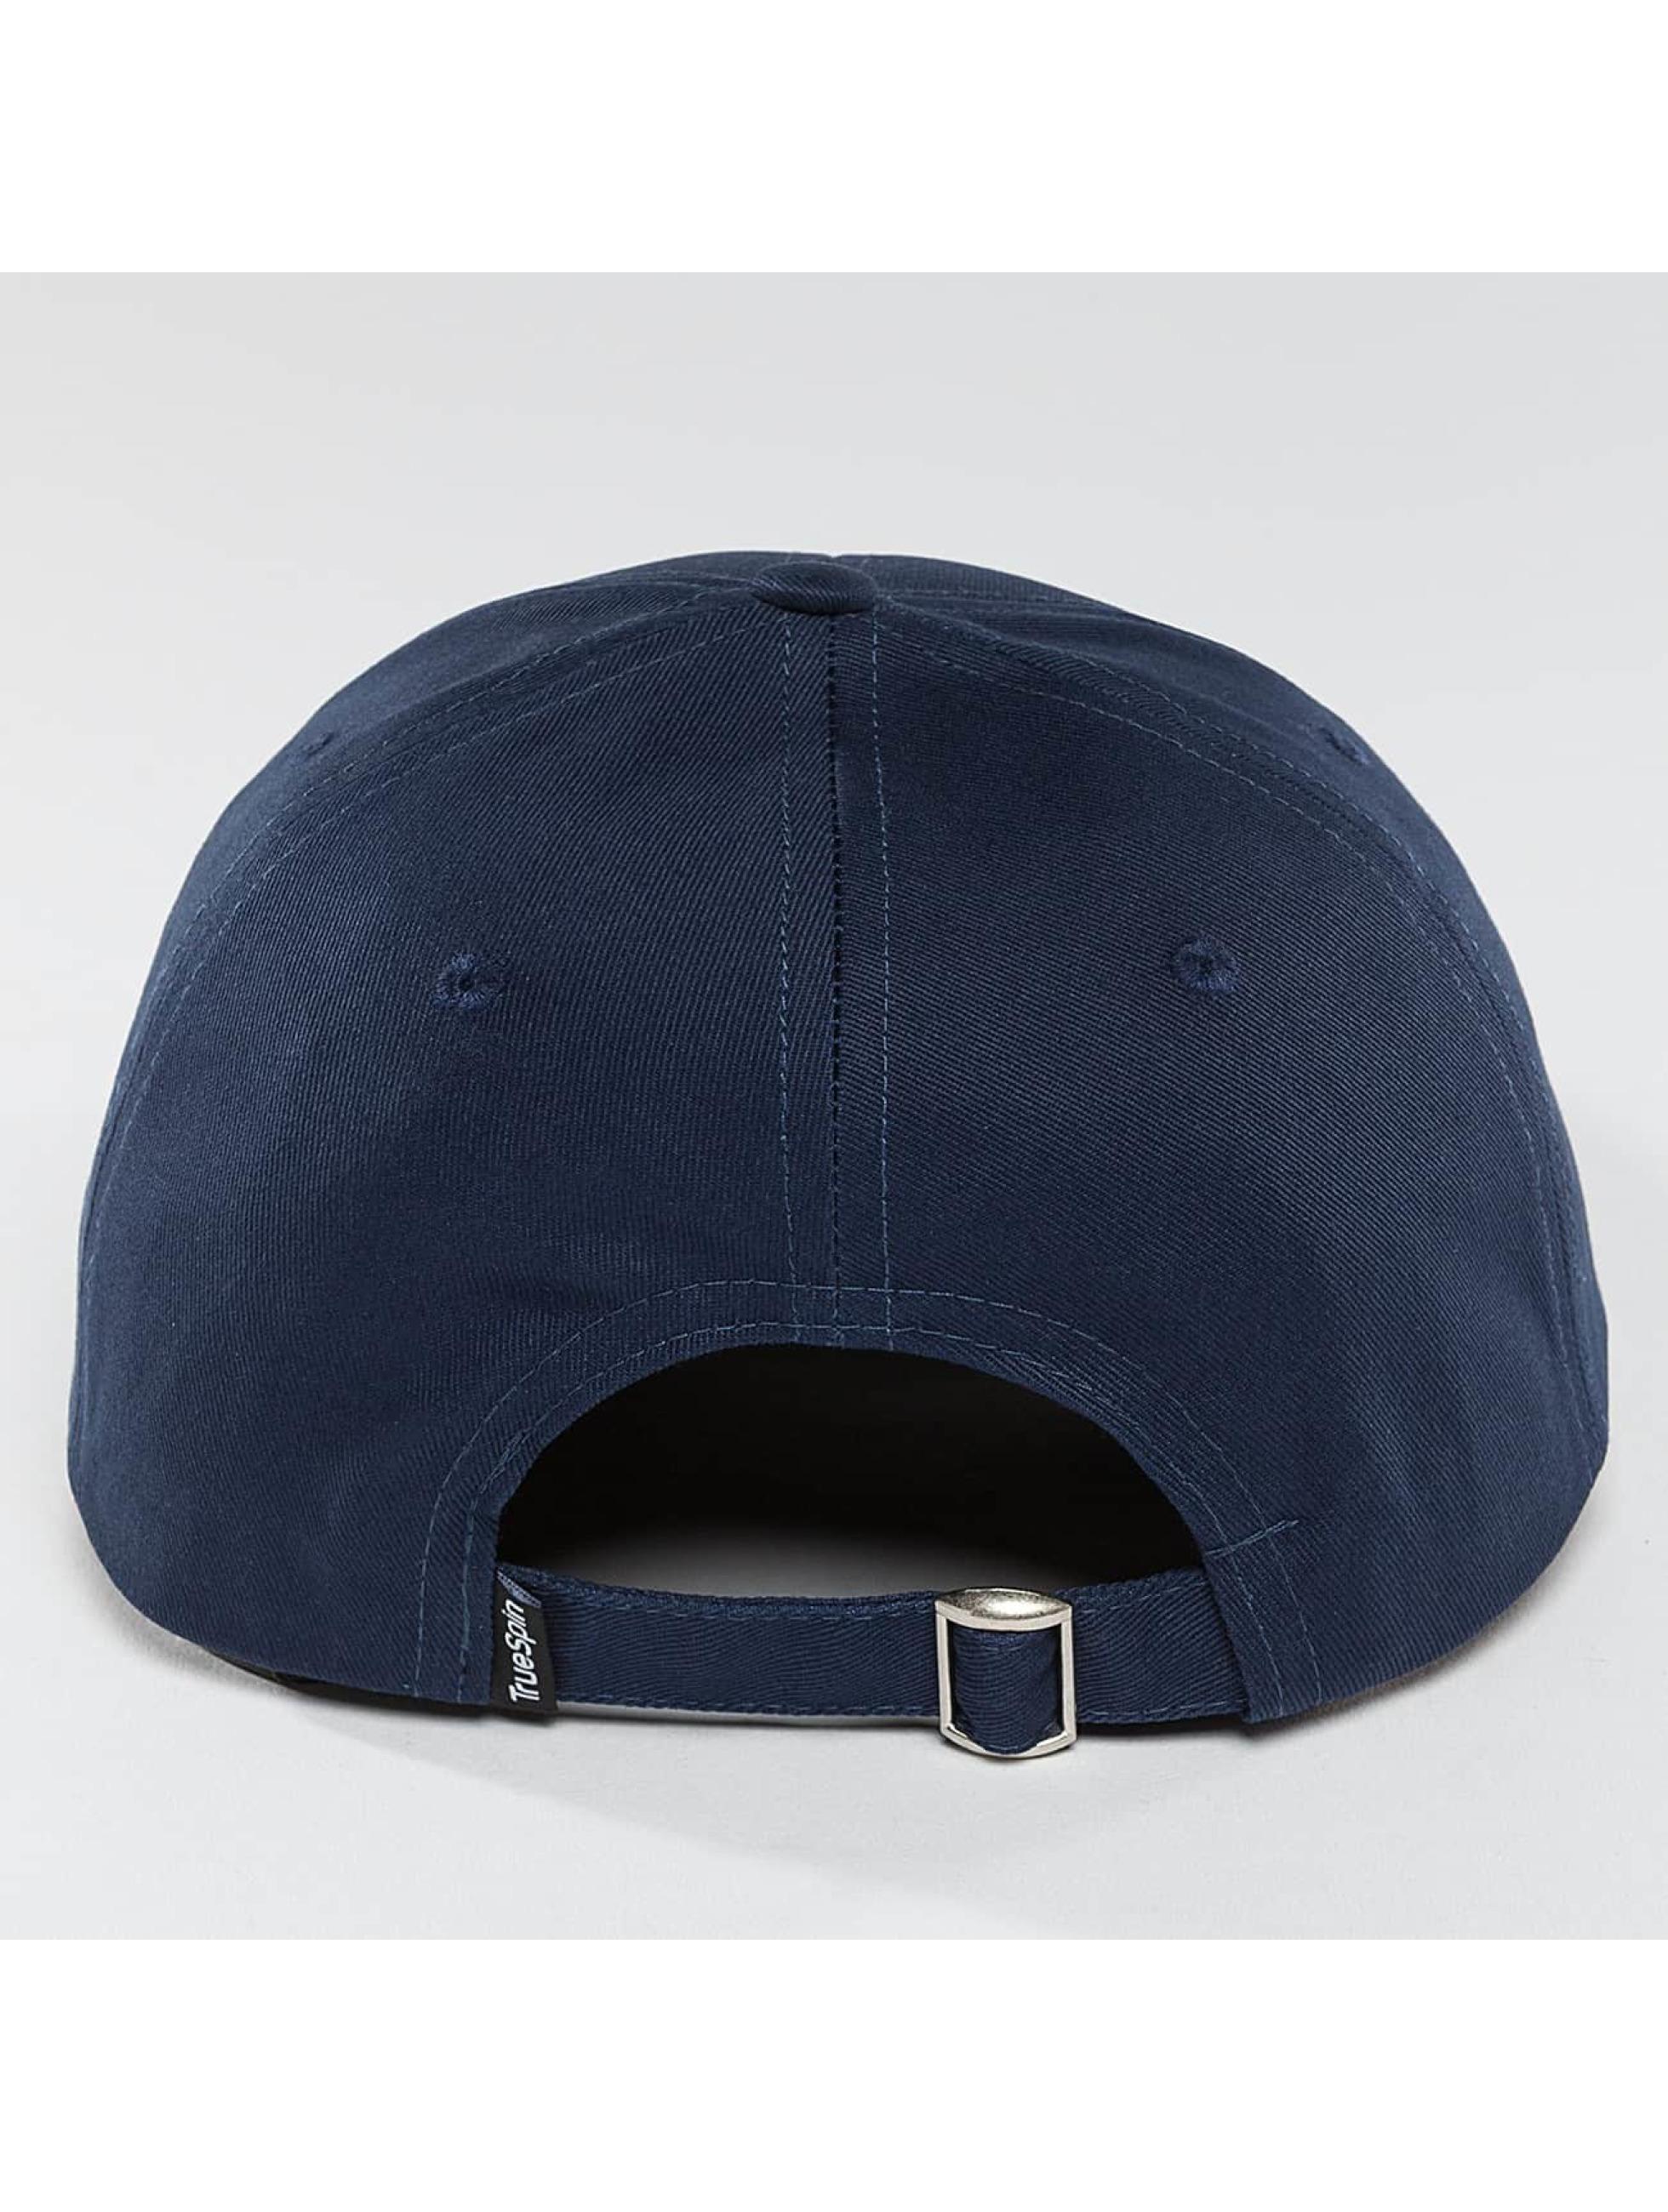 TrueSpin Casquette Snapback & Strapback SB50 bleu